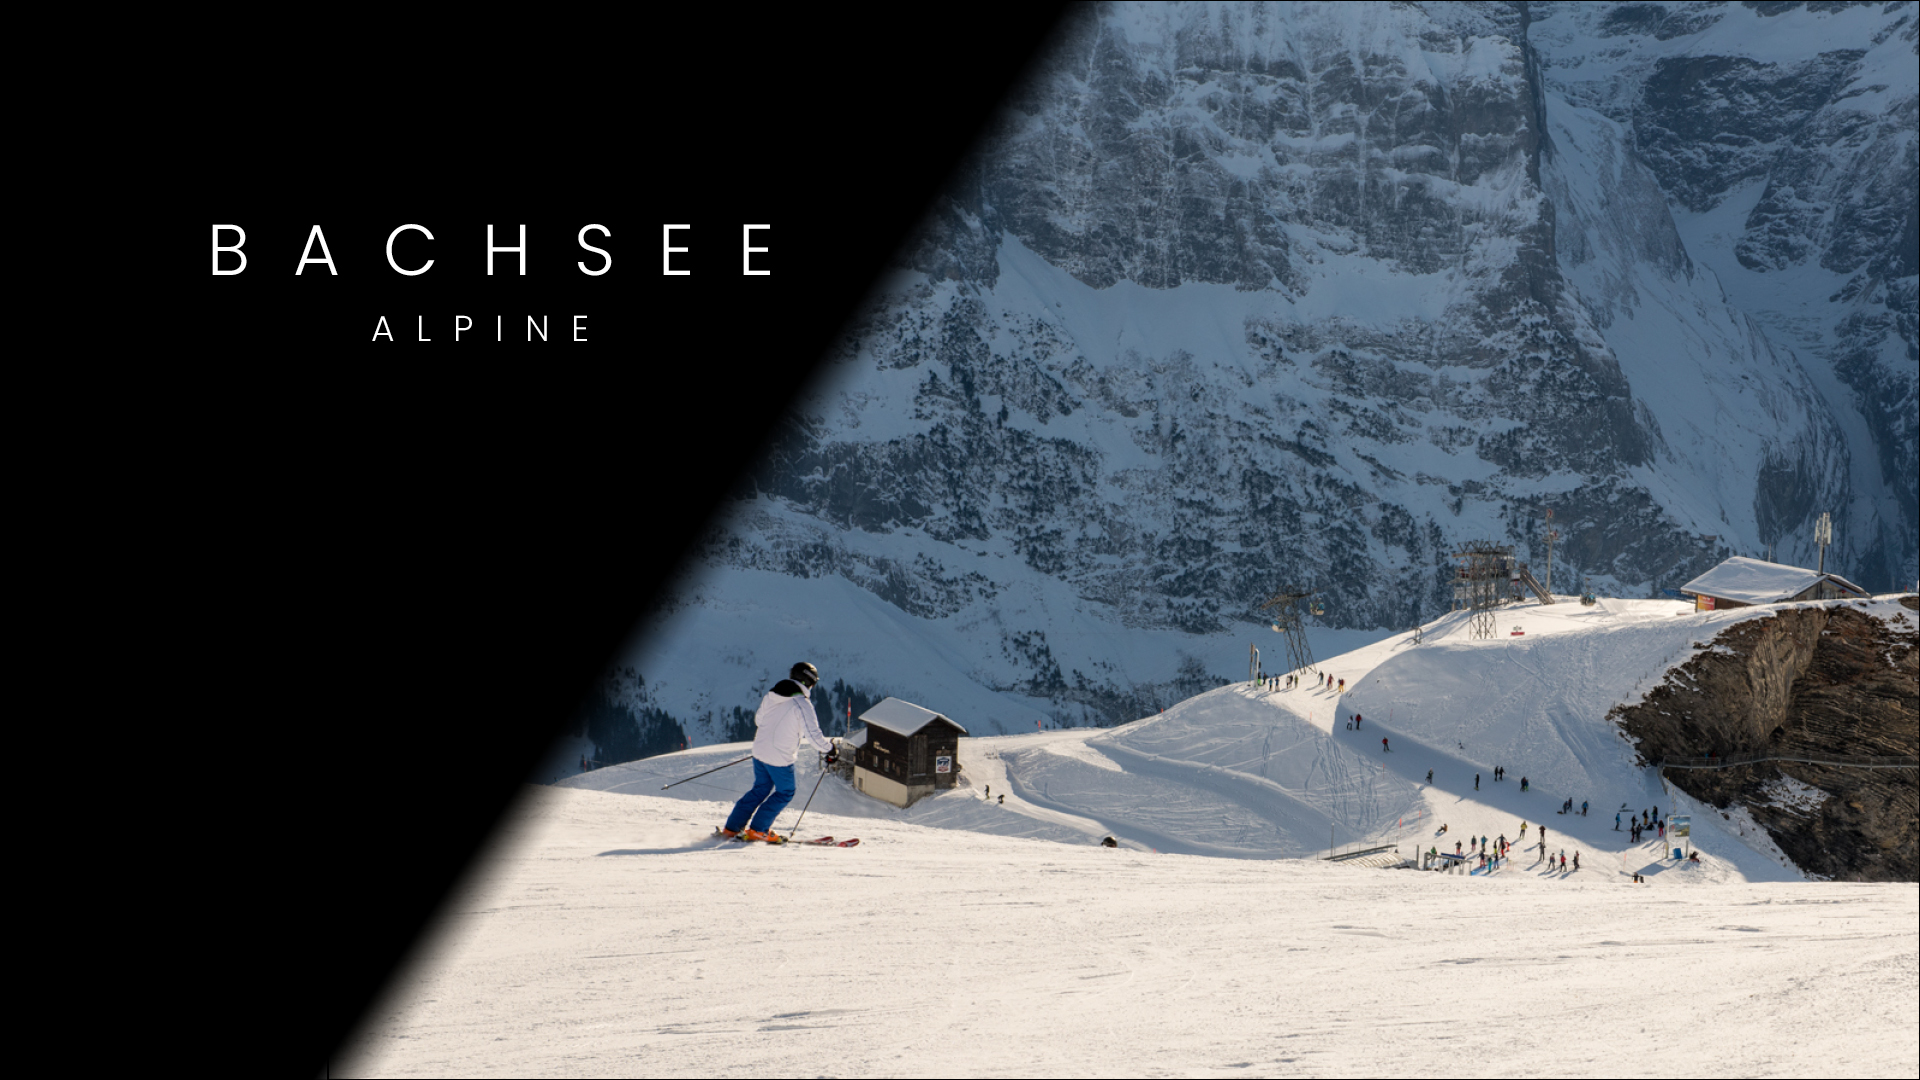 Bachalpsee Alpine